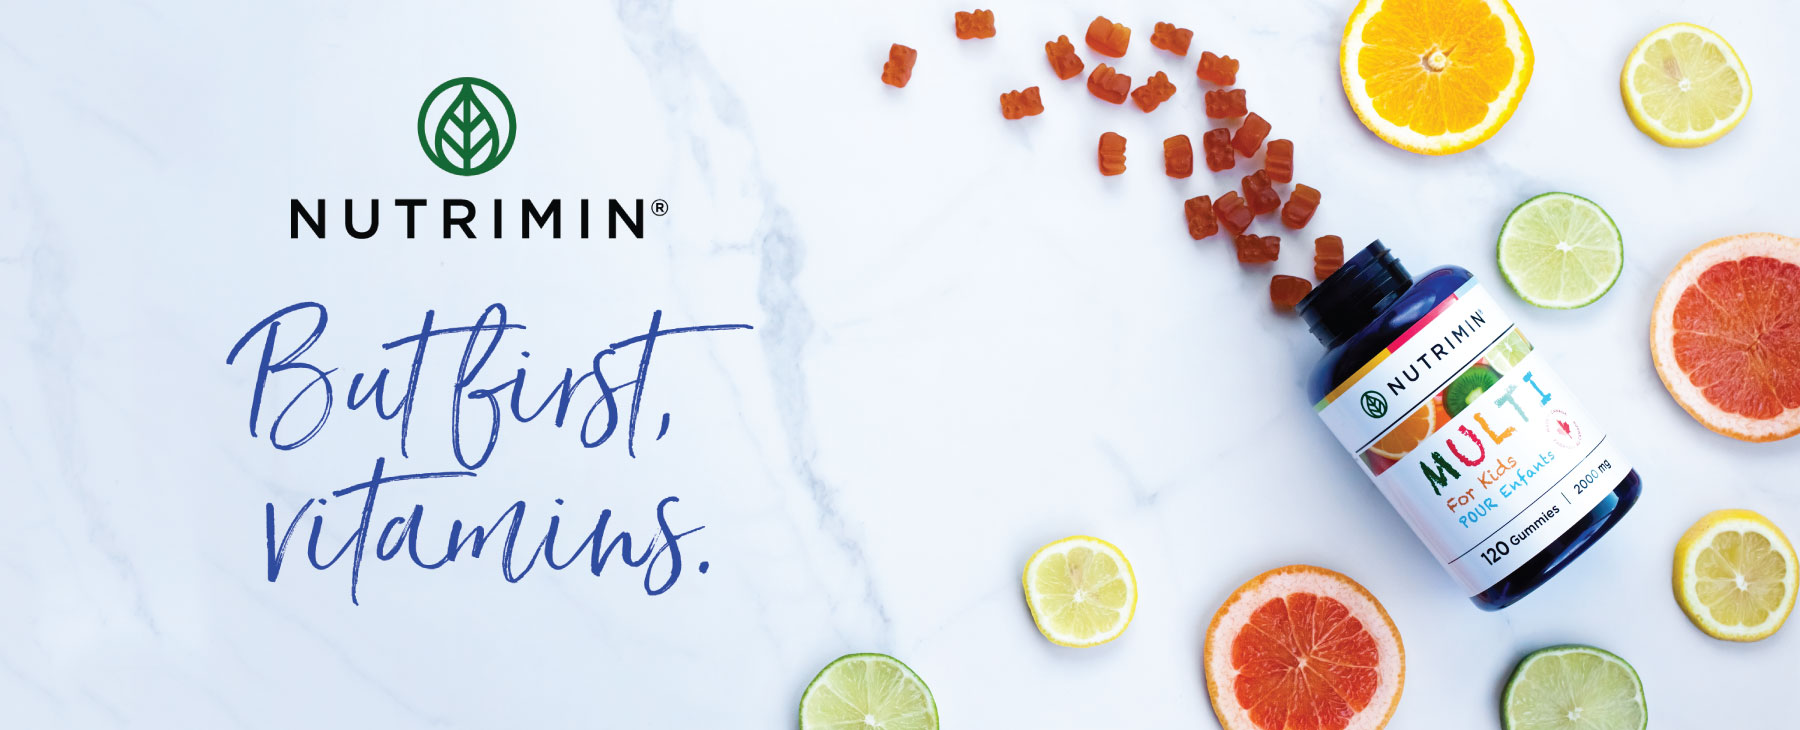 Nutrimin Canada Vitamins